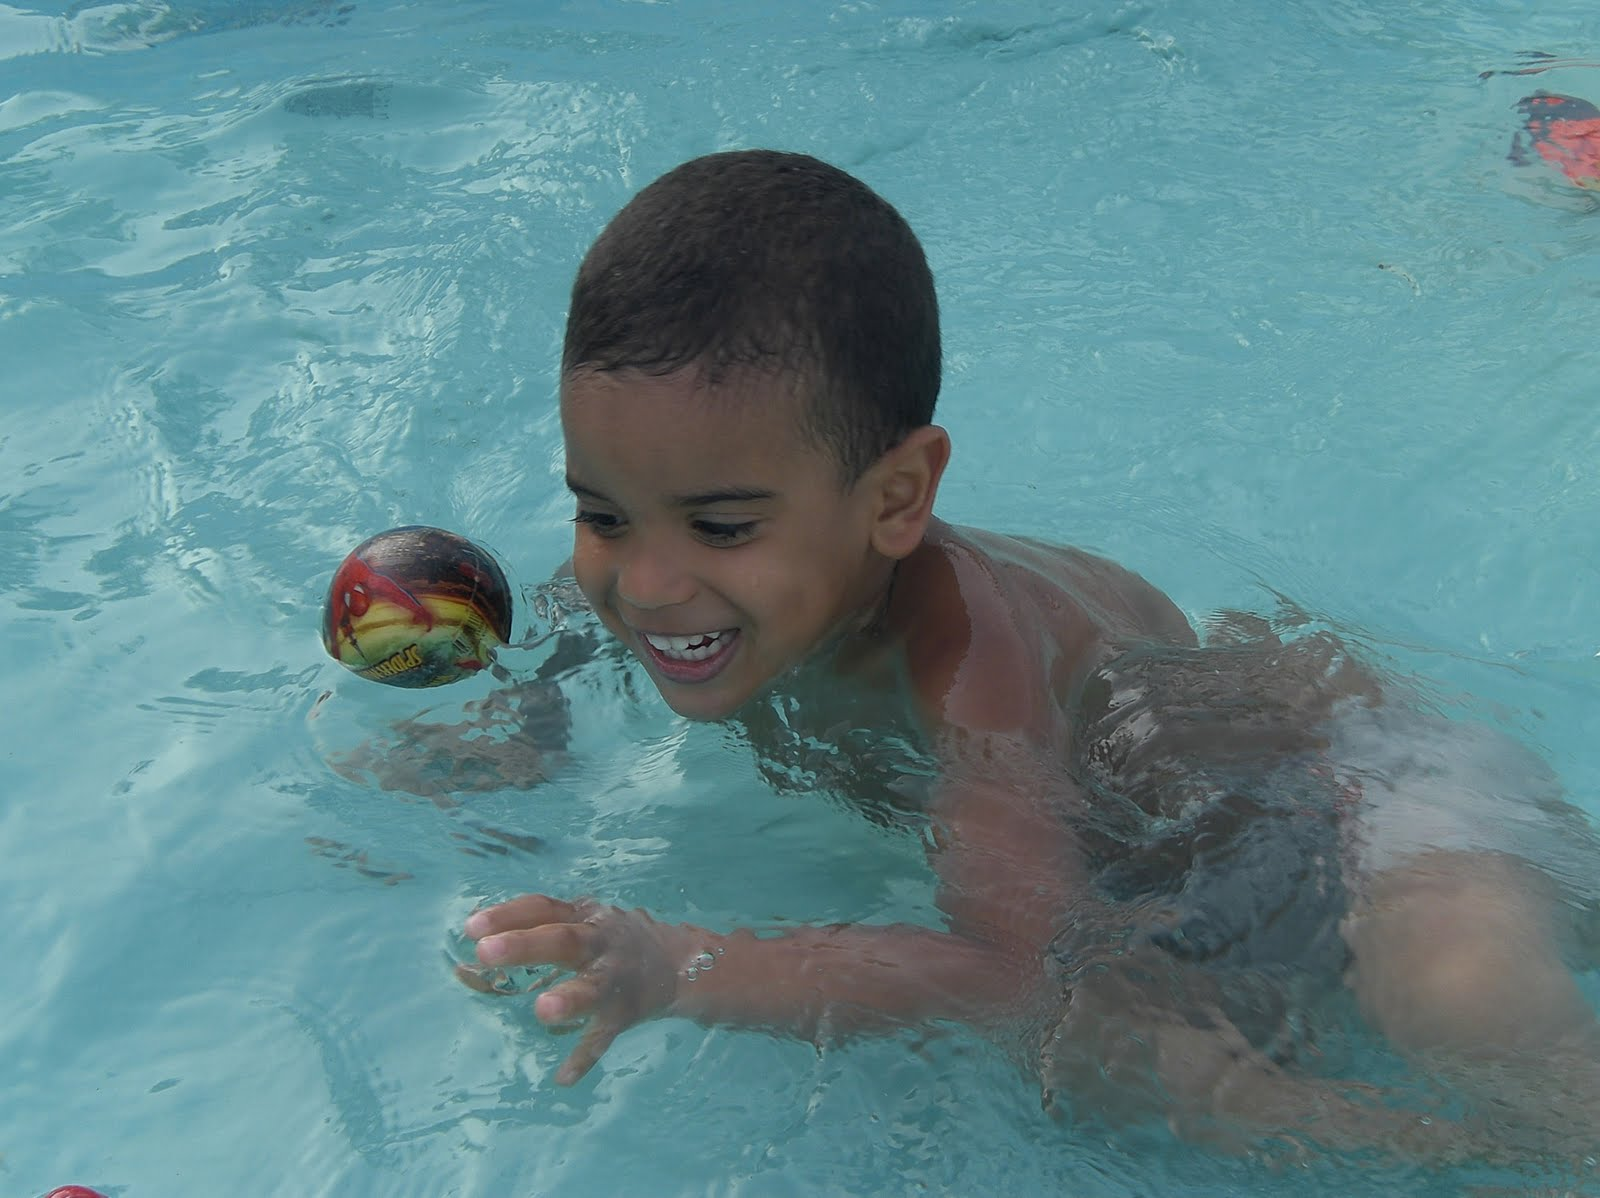 http://3.bp.blogspot.com/_y4bFdFrS7Ws/S7kwnUPmhbI/AAAAAAAAMqU/AesWIKbHkH4/s1600/Angel+Eduardo.jpg